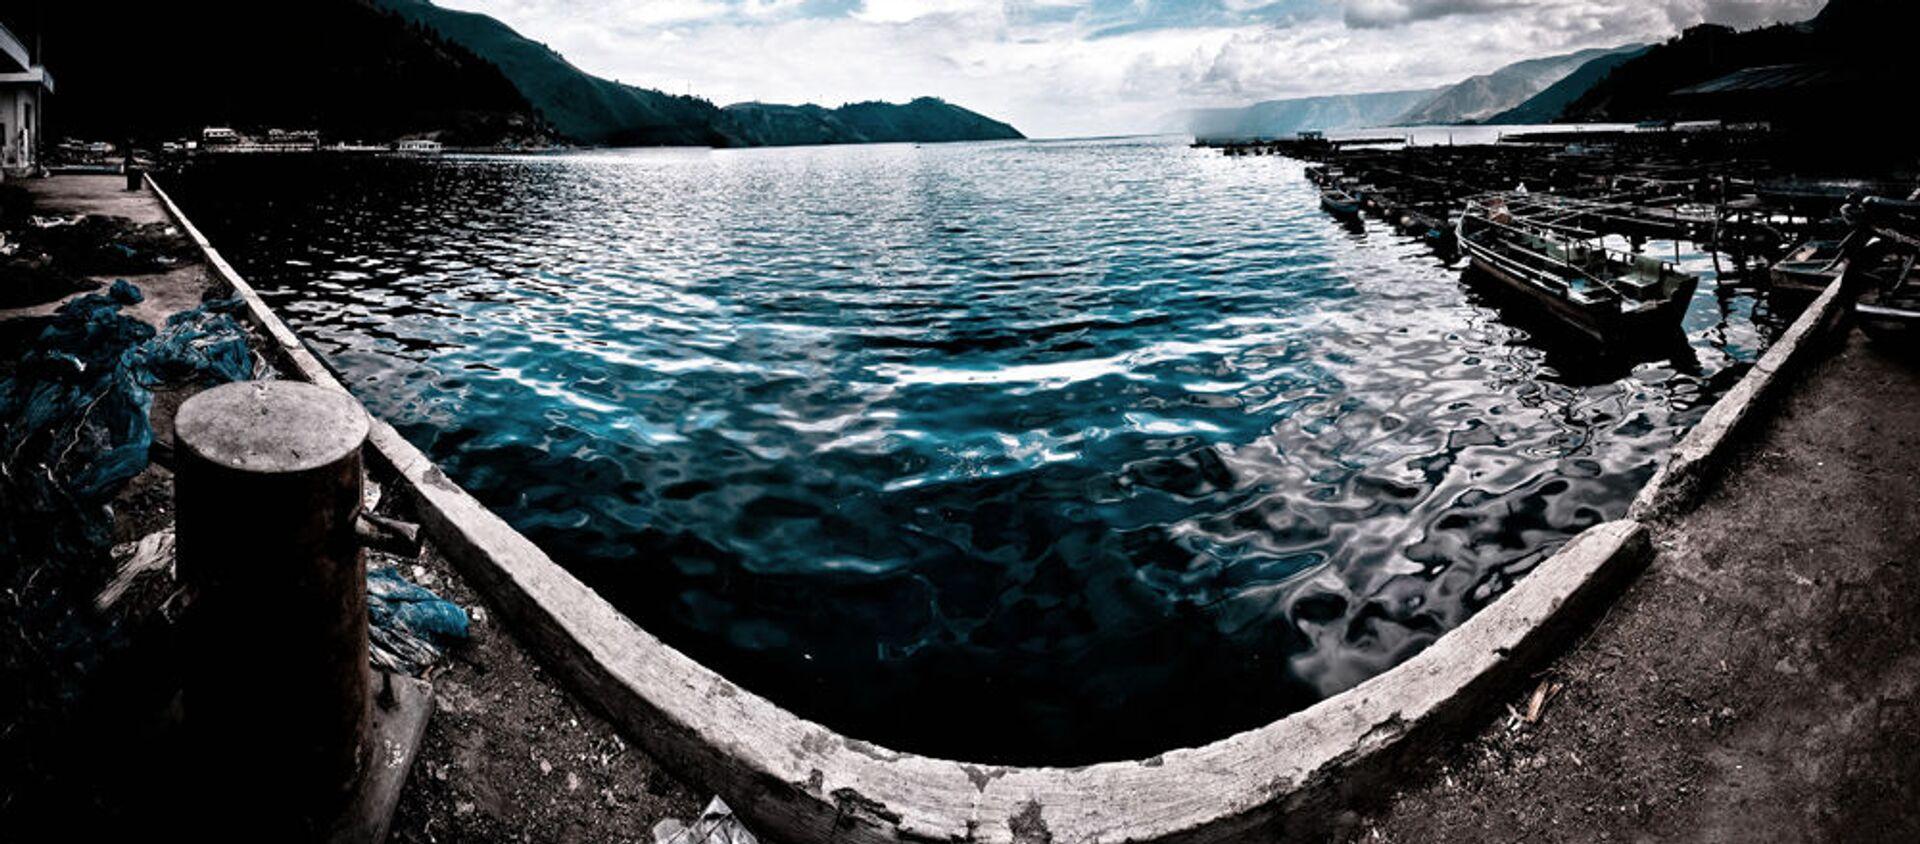 Supervulkán a jezero Toba, Indonésie - Sputnik Česká republika, 1920, 03.04.2021